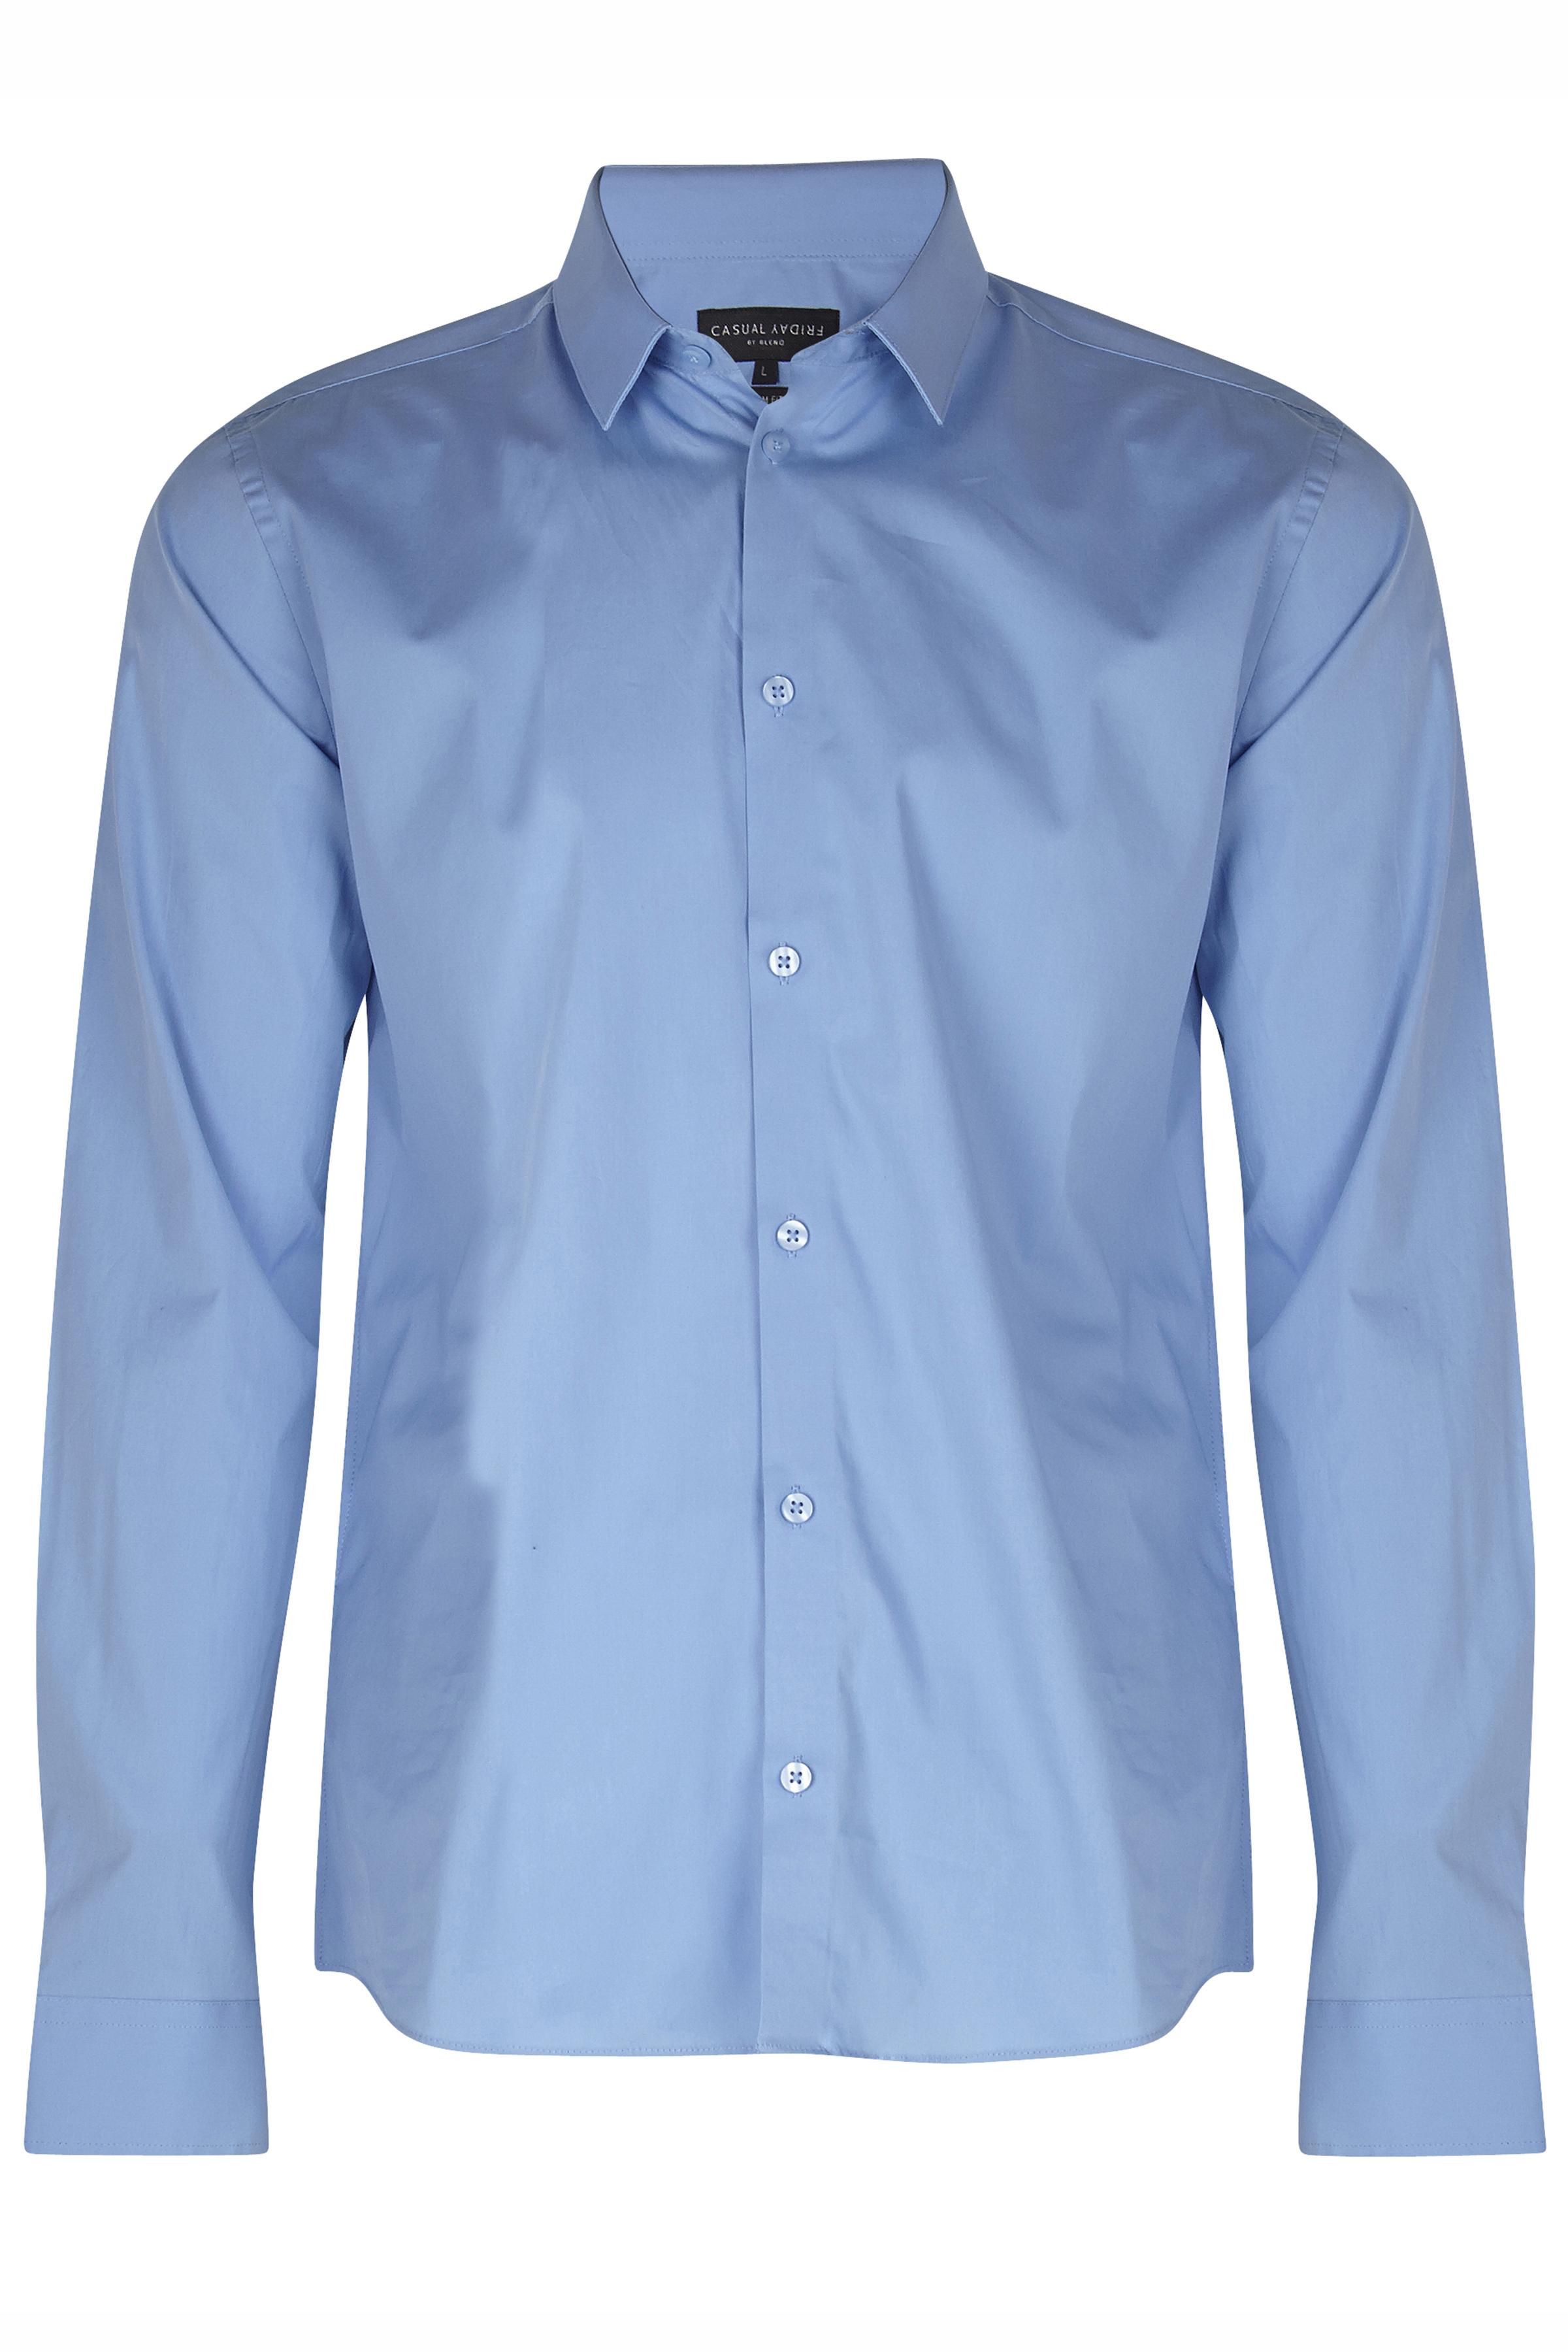 Lyseblå Langærmet skjorte fra Casual Friday – Køb Lyseblå Langærmet skjorte fra str. XXS-3XL her